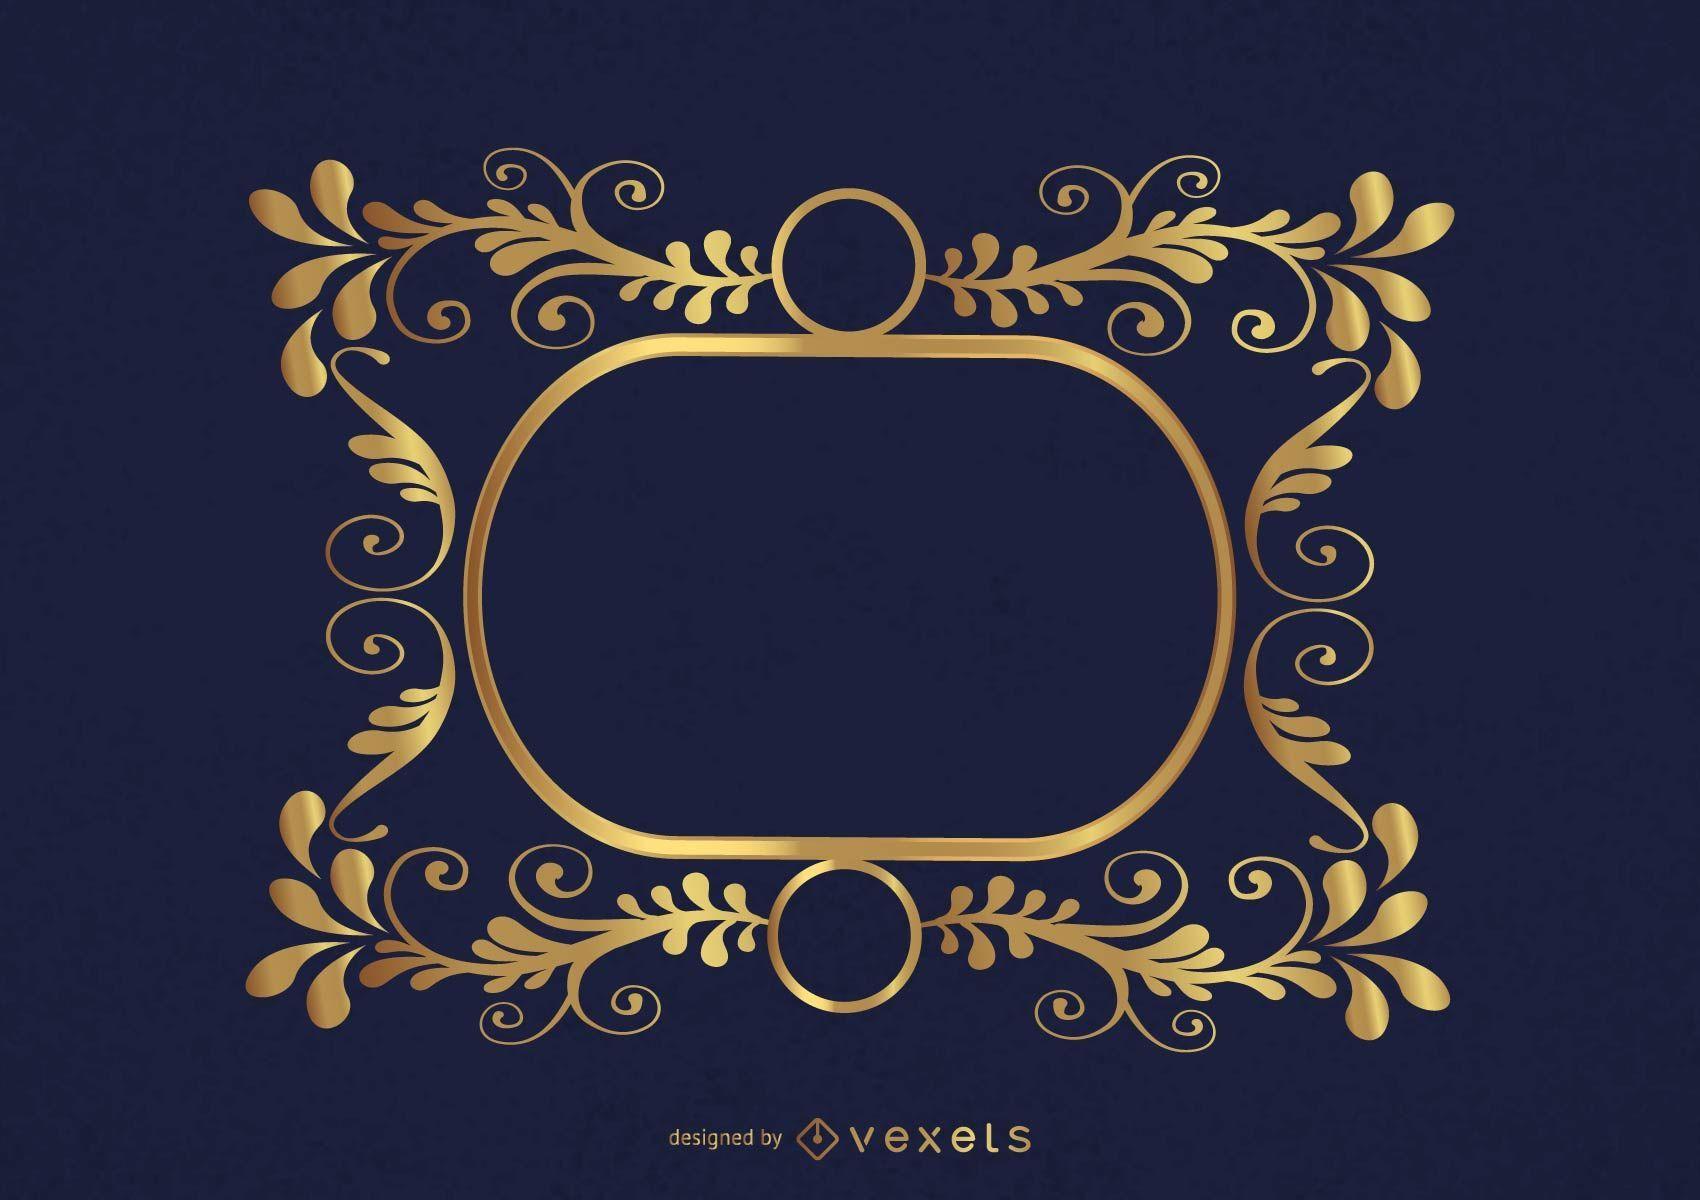 Circles Swirls Golden Frame